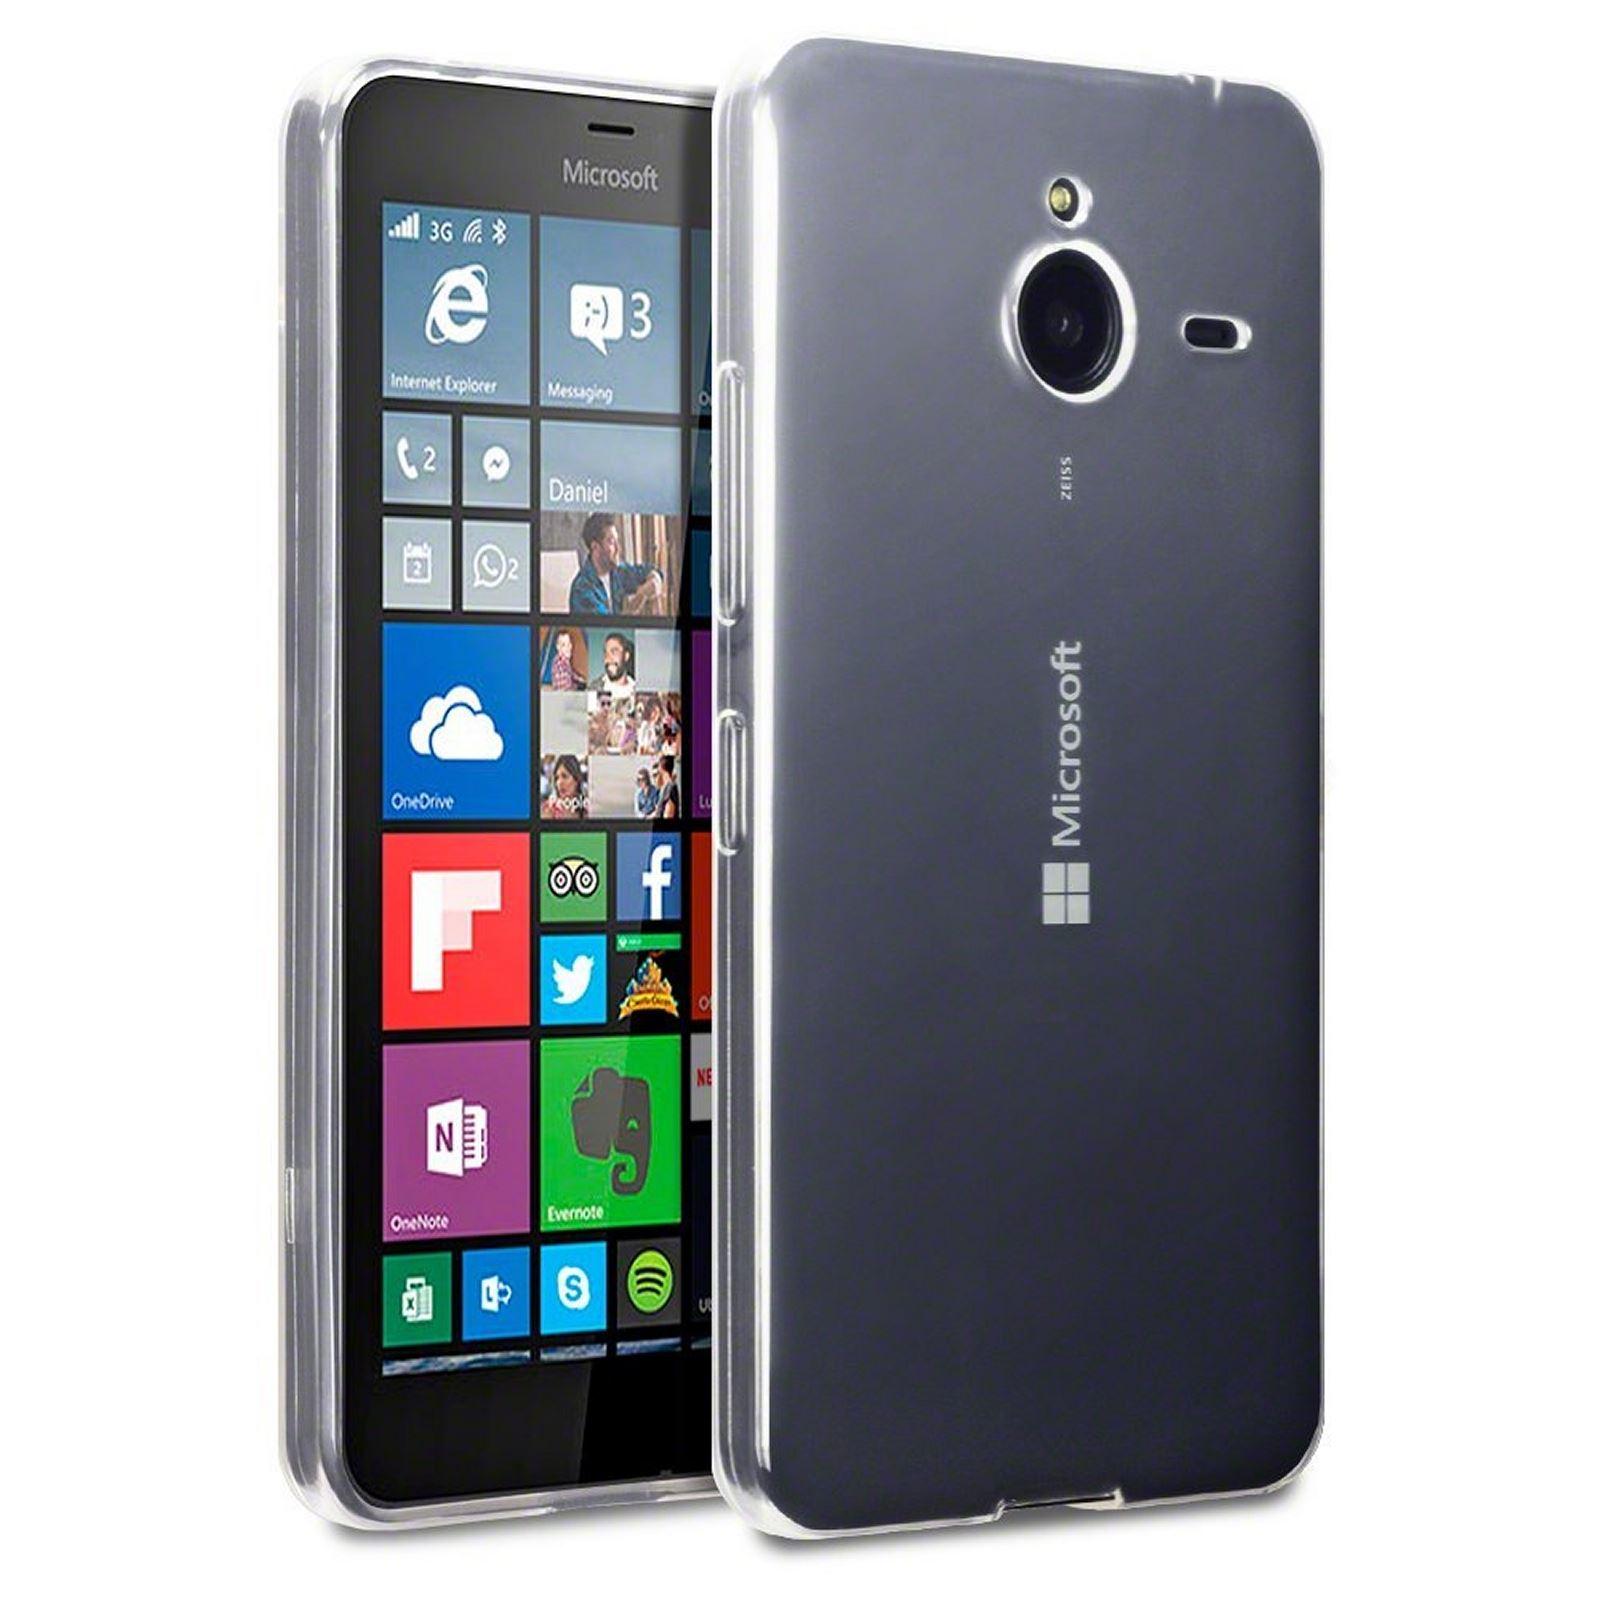 Microsoft Lumia 640 XL TPU Gel Silicone Skin Case Cover (only for Black 640 XL) | eBay